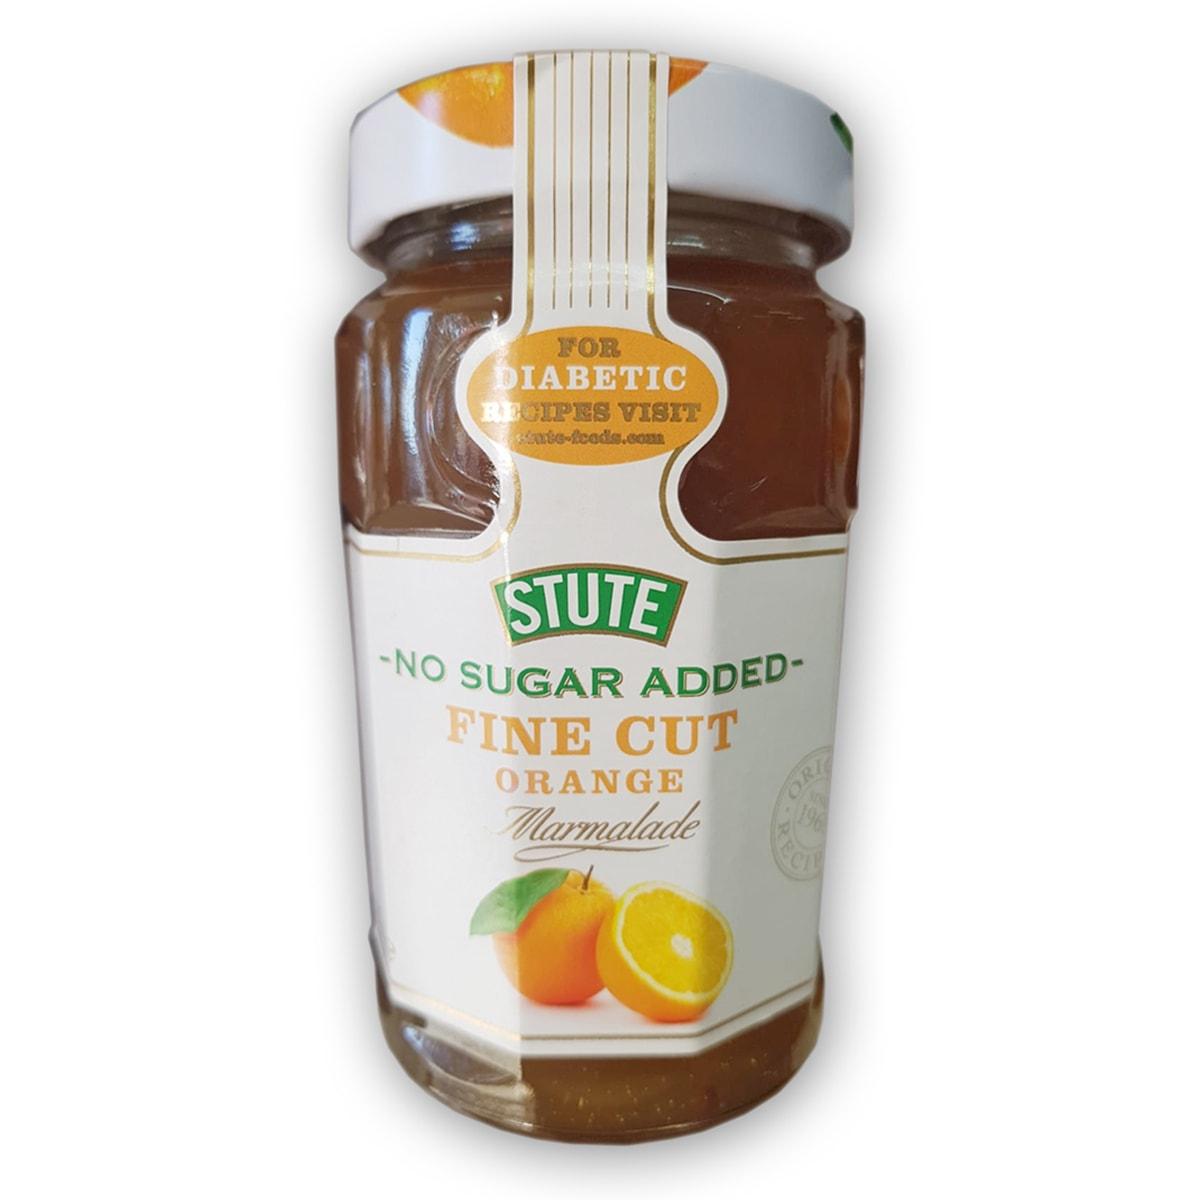 Buy Stute Diabetic Fine Cut Orange Extra Marmalade Jam (No Sugar Added) - 430 gm